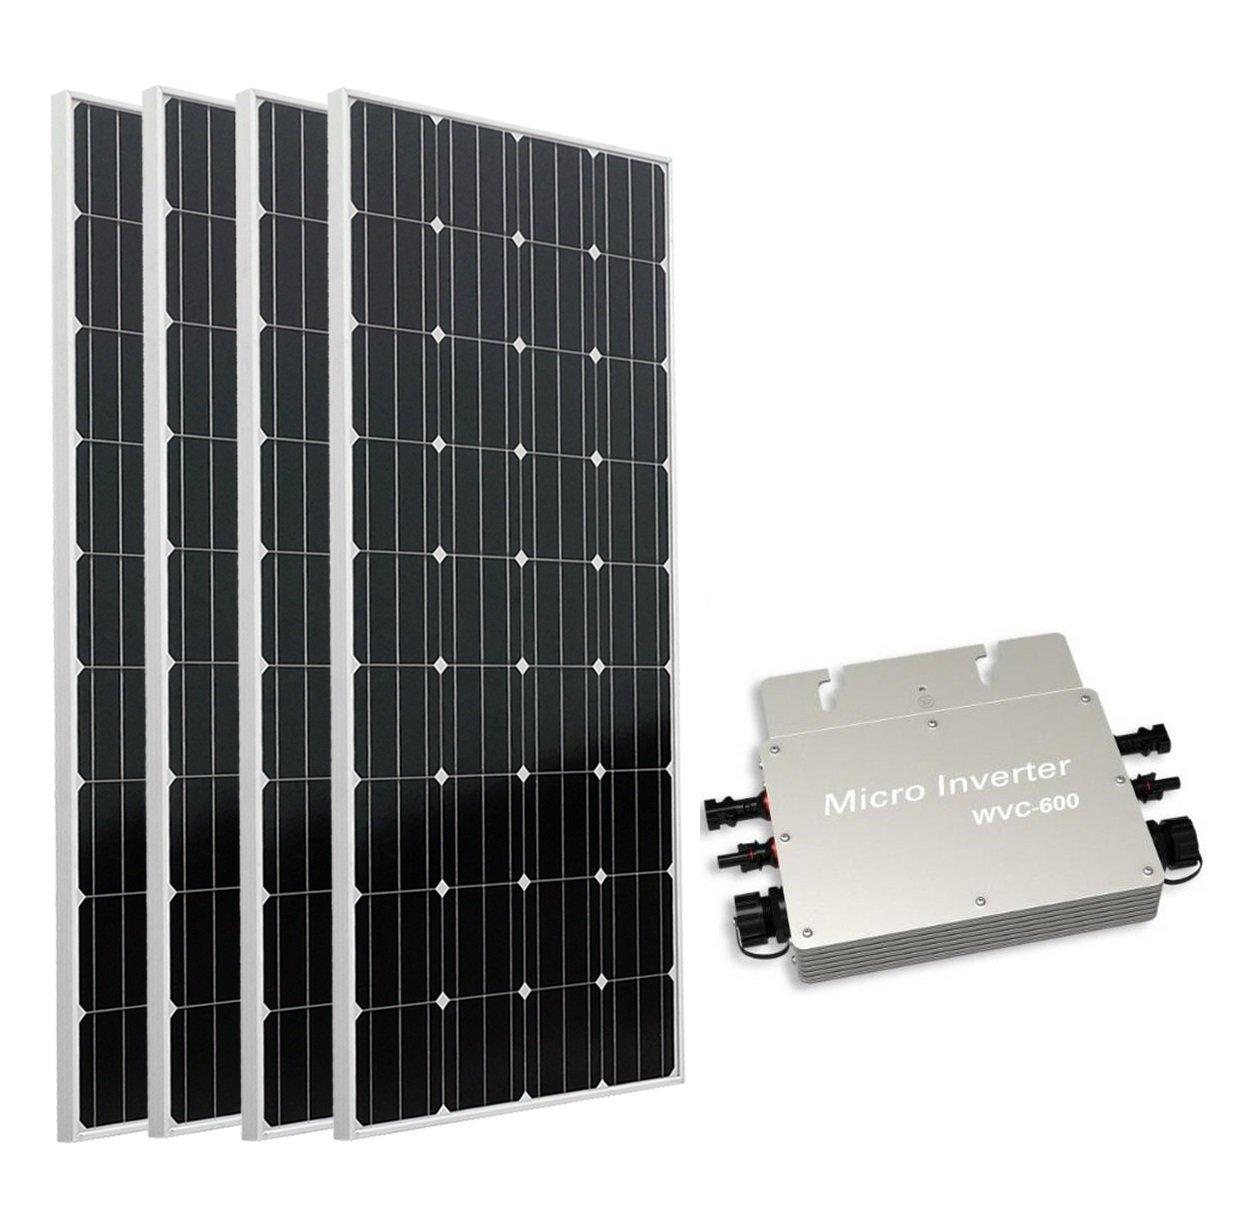 ECO-WORTHY 600W auf Grid Tie Solar Panel System: 4 160 W Mono Solarmodul W/600 W Wasserdicht Grid Tie Power Inverter für Home Backup Power